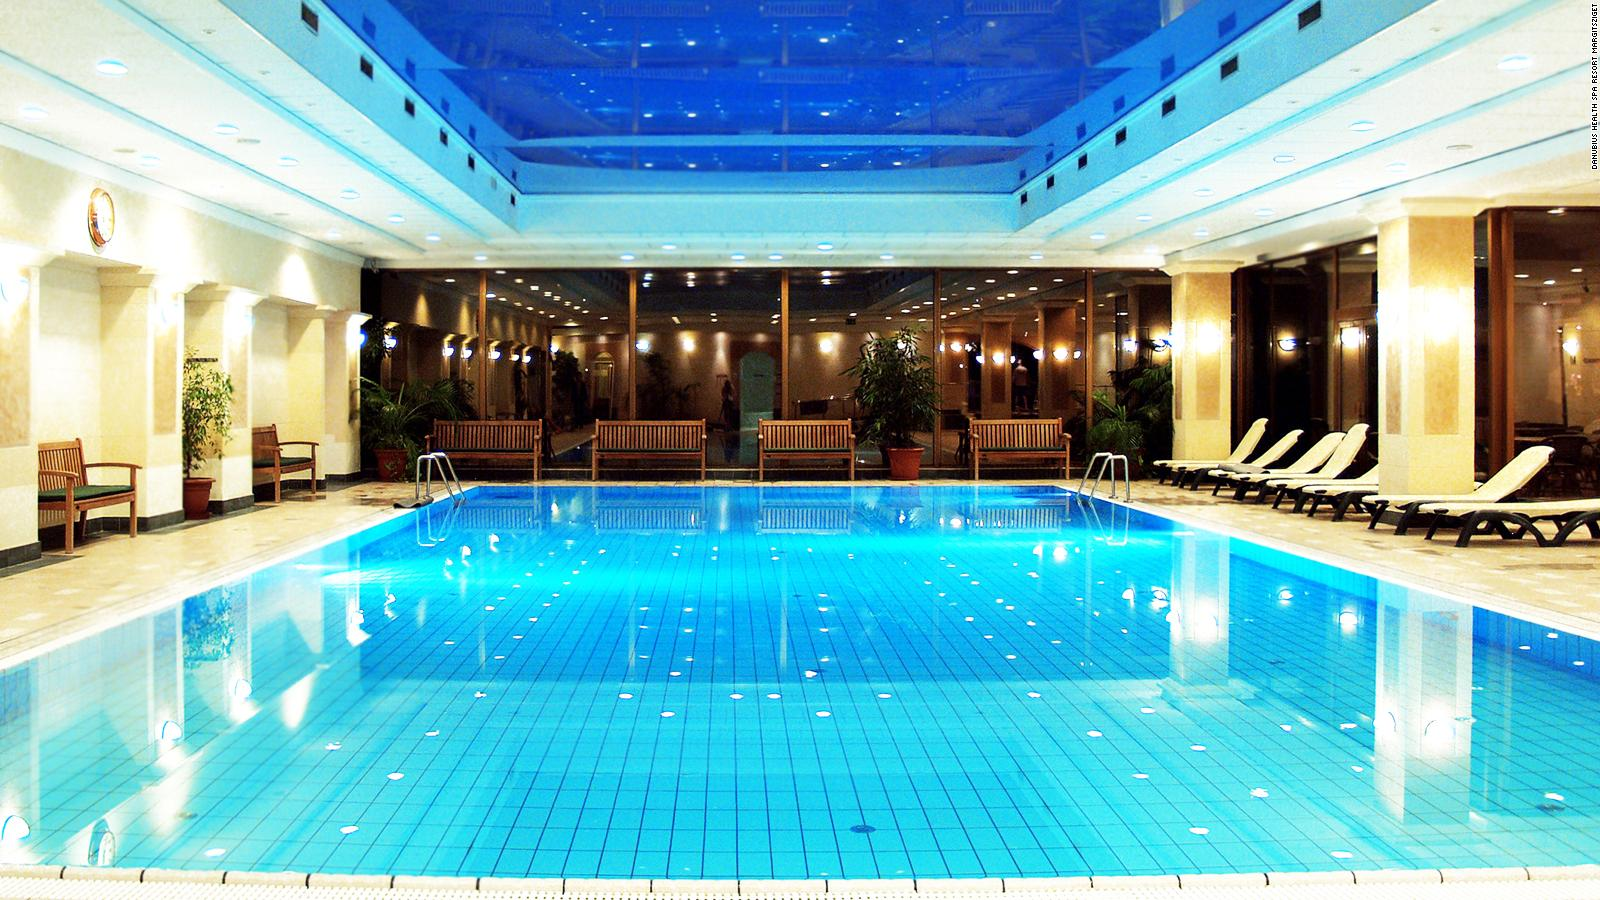 10 of the best Budapest spas and bathhouses | CNN Travel Resort Pool Bathroom Designs Html on steam room bathrooms, swimming pool bathrooms, public pool bathrooms, outdoor pool bathrooms, beach bathrooms, gym bathrooms, spa bathrooms, golf bathrooms, restaurant bathrooms, gas station bathrooms, luxury pool bathrooms, hair salon bathrooms,